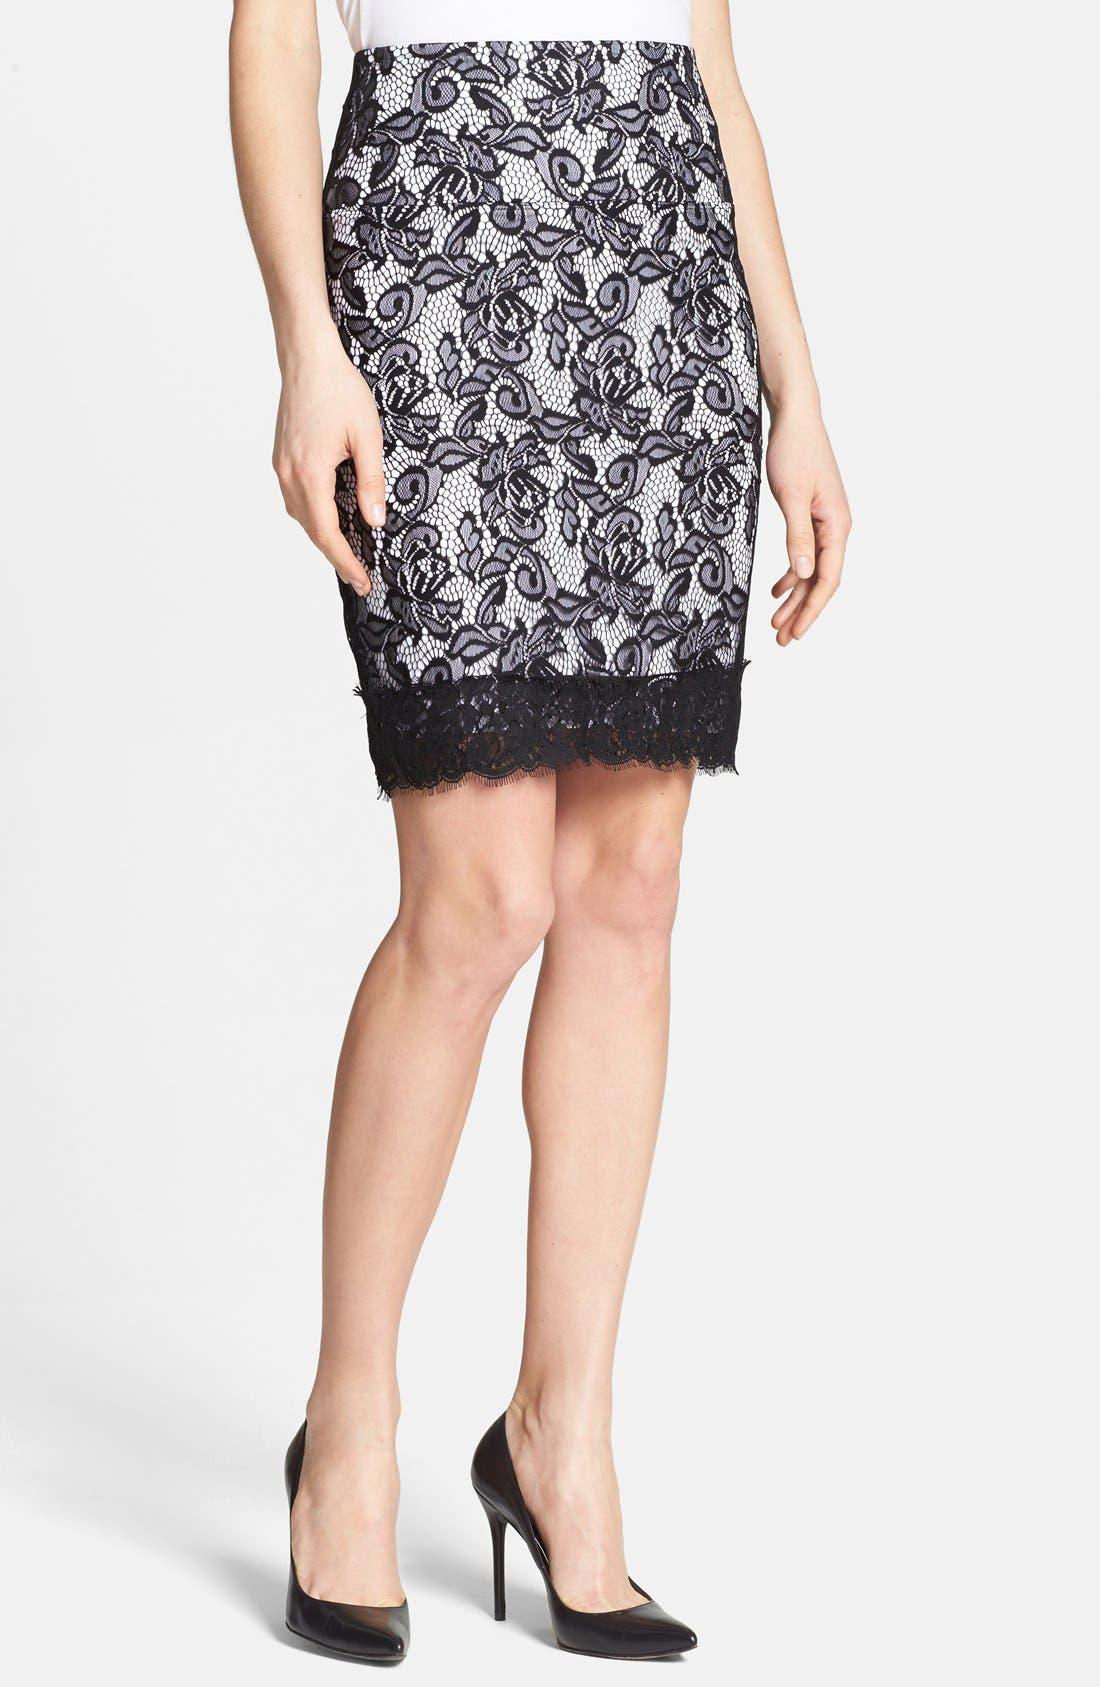 Main Image - Lyssé Lace Overlay Control Top Pencil Skirt